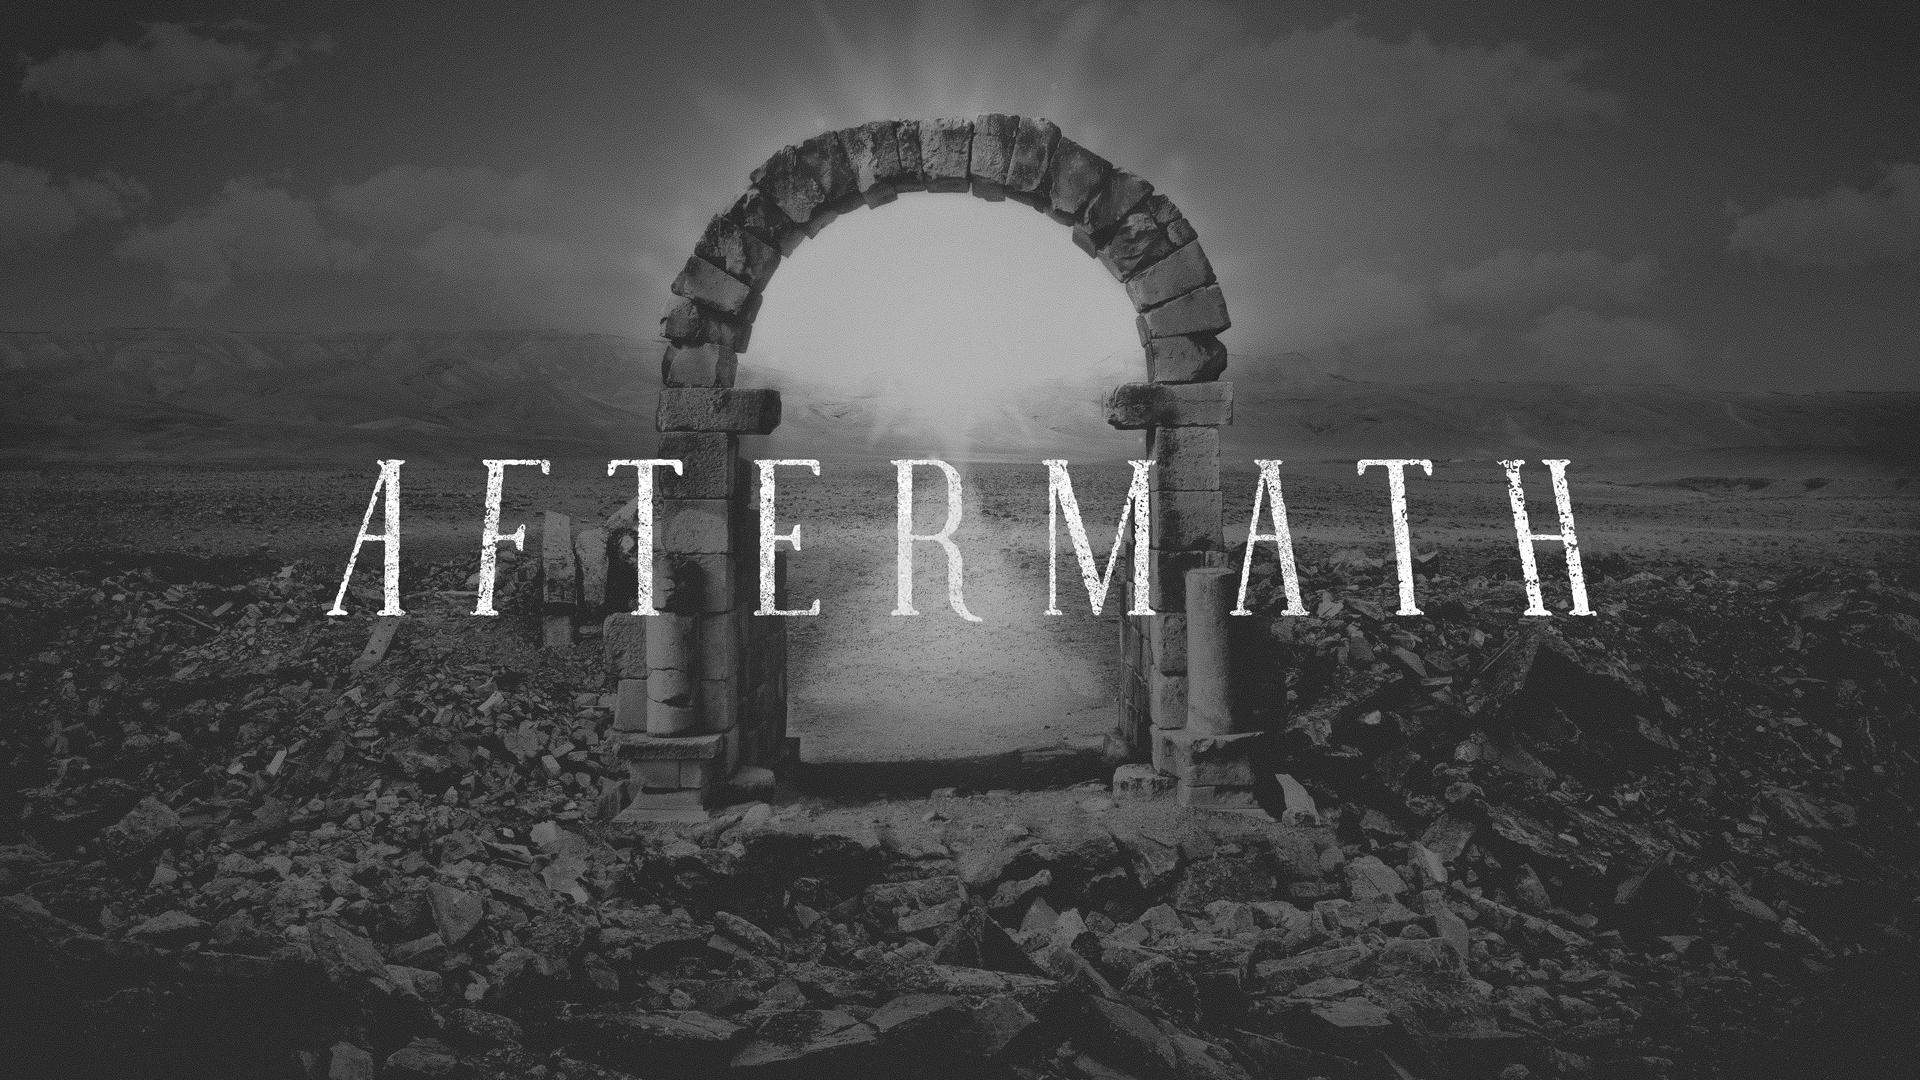 Aftermath_Plasma_1080.jpg